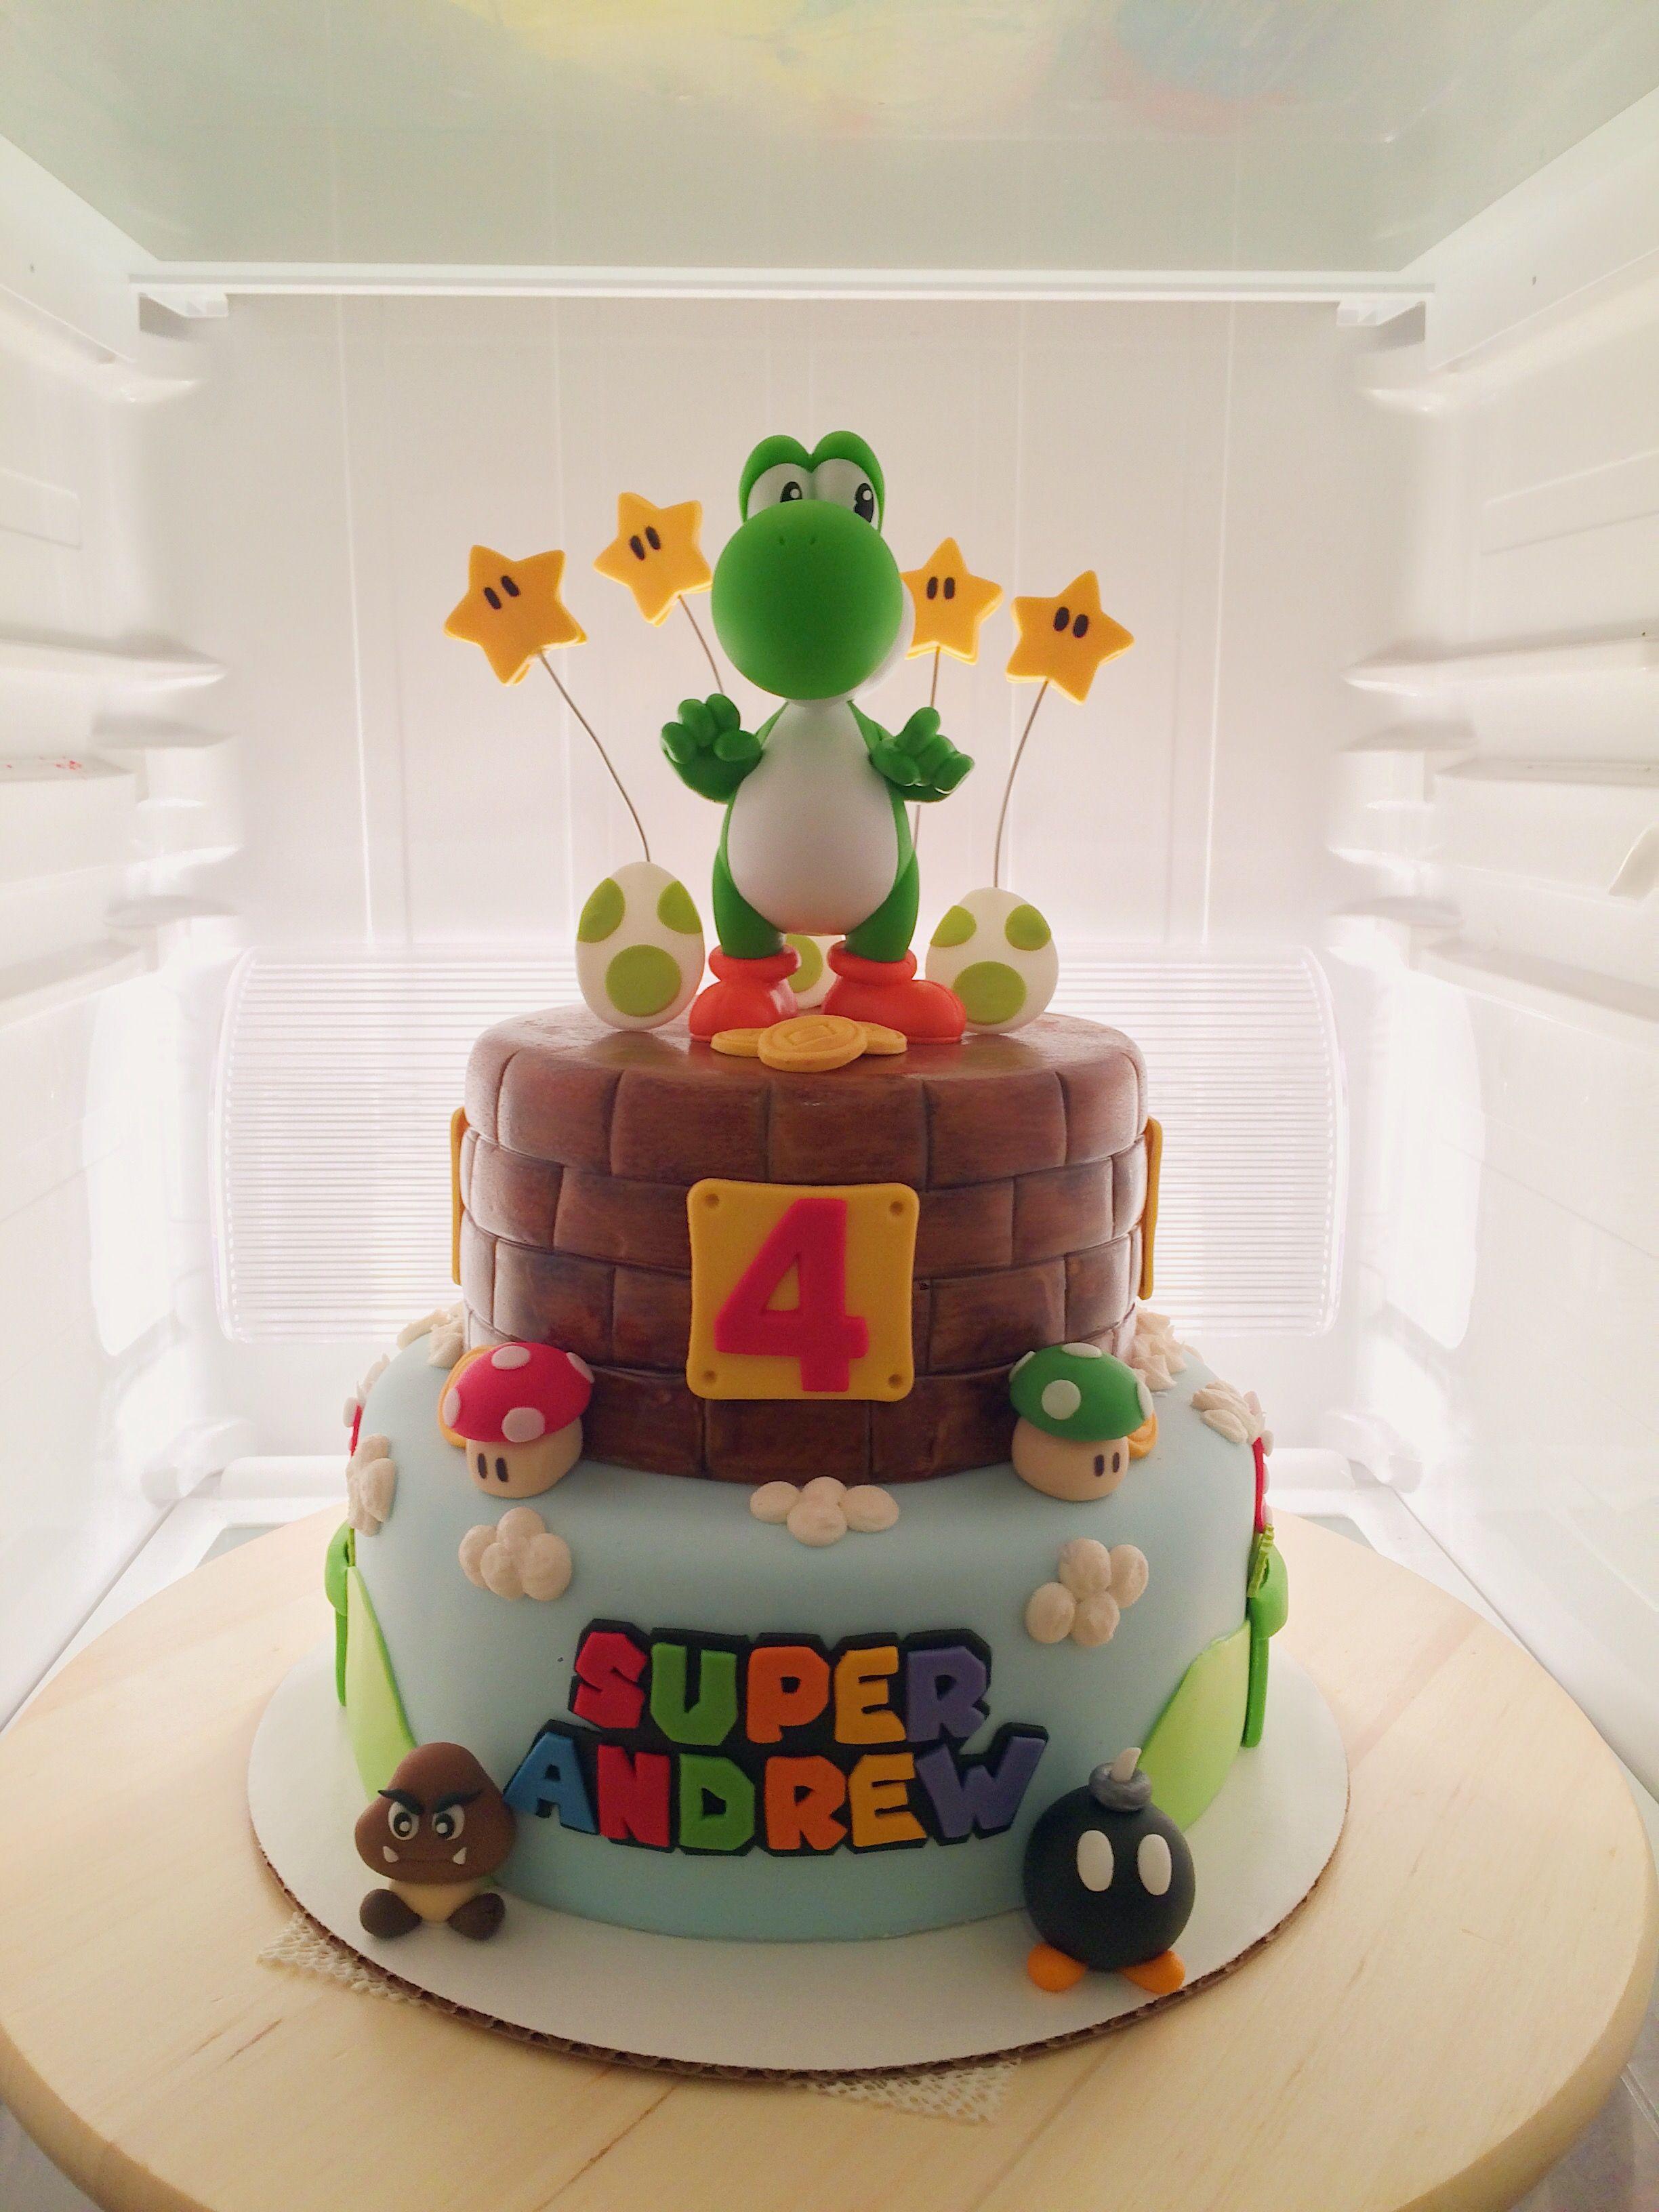 Awesome Yoshi Super Mario Theme Birthday Cake Yoshi Toy Purchased From Funny Birthday Cards Online Necthendildamsfinfo